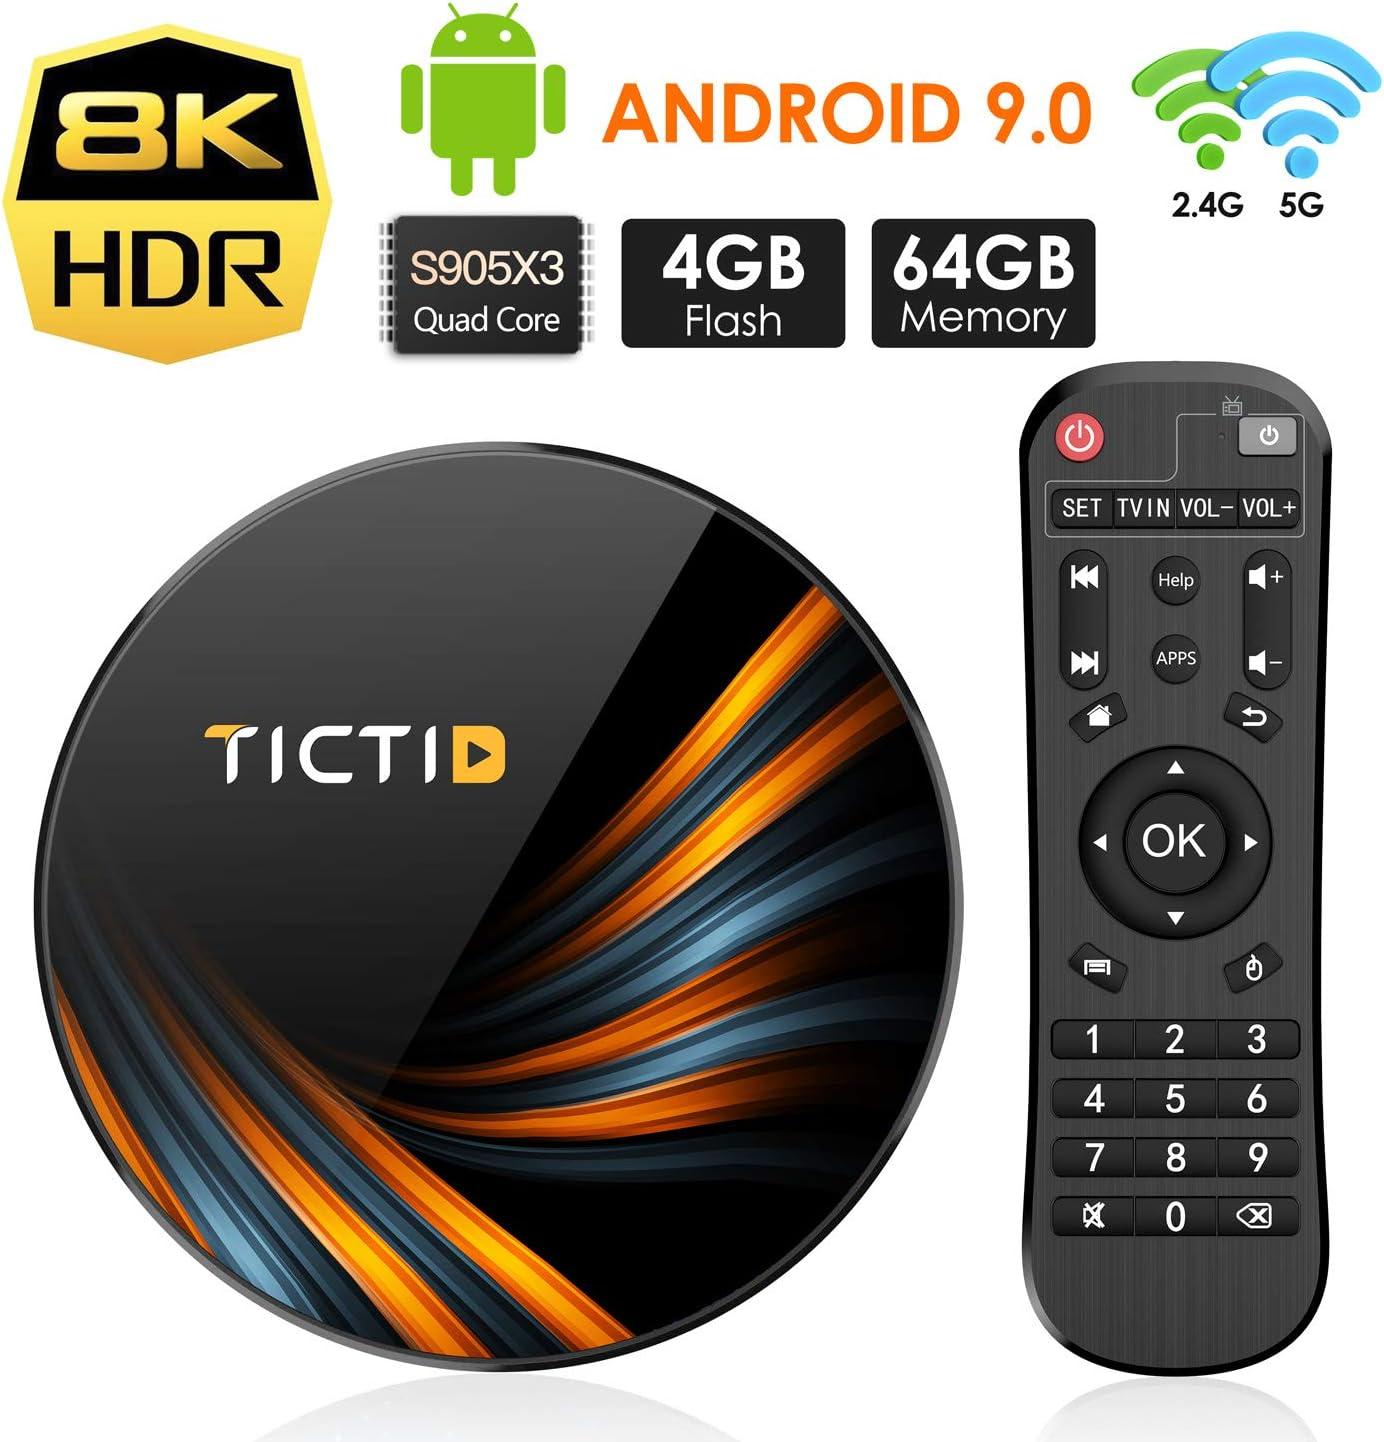 TICTID Android 9.0 TV Box 【4G+64G】 S905X3 Quad-Core, 1000M LAN ...